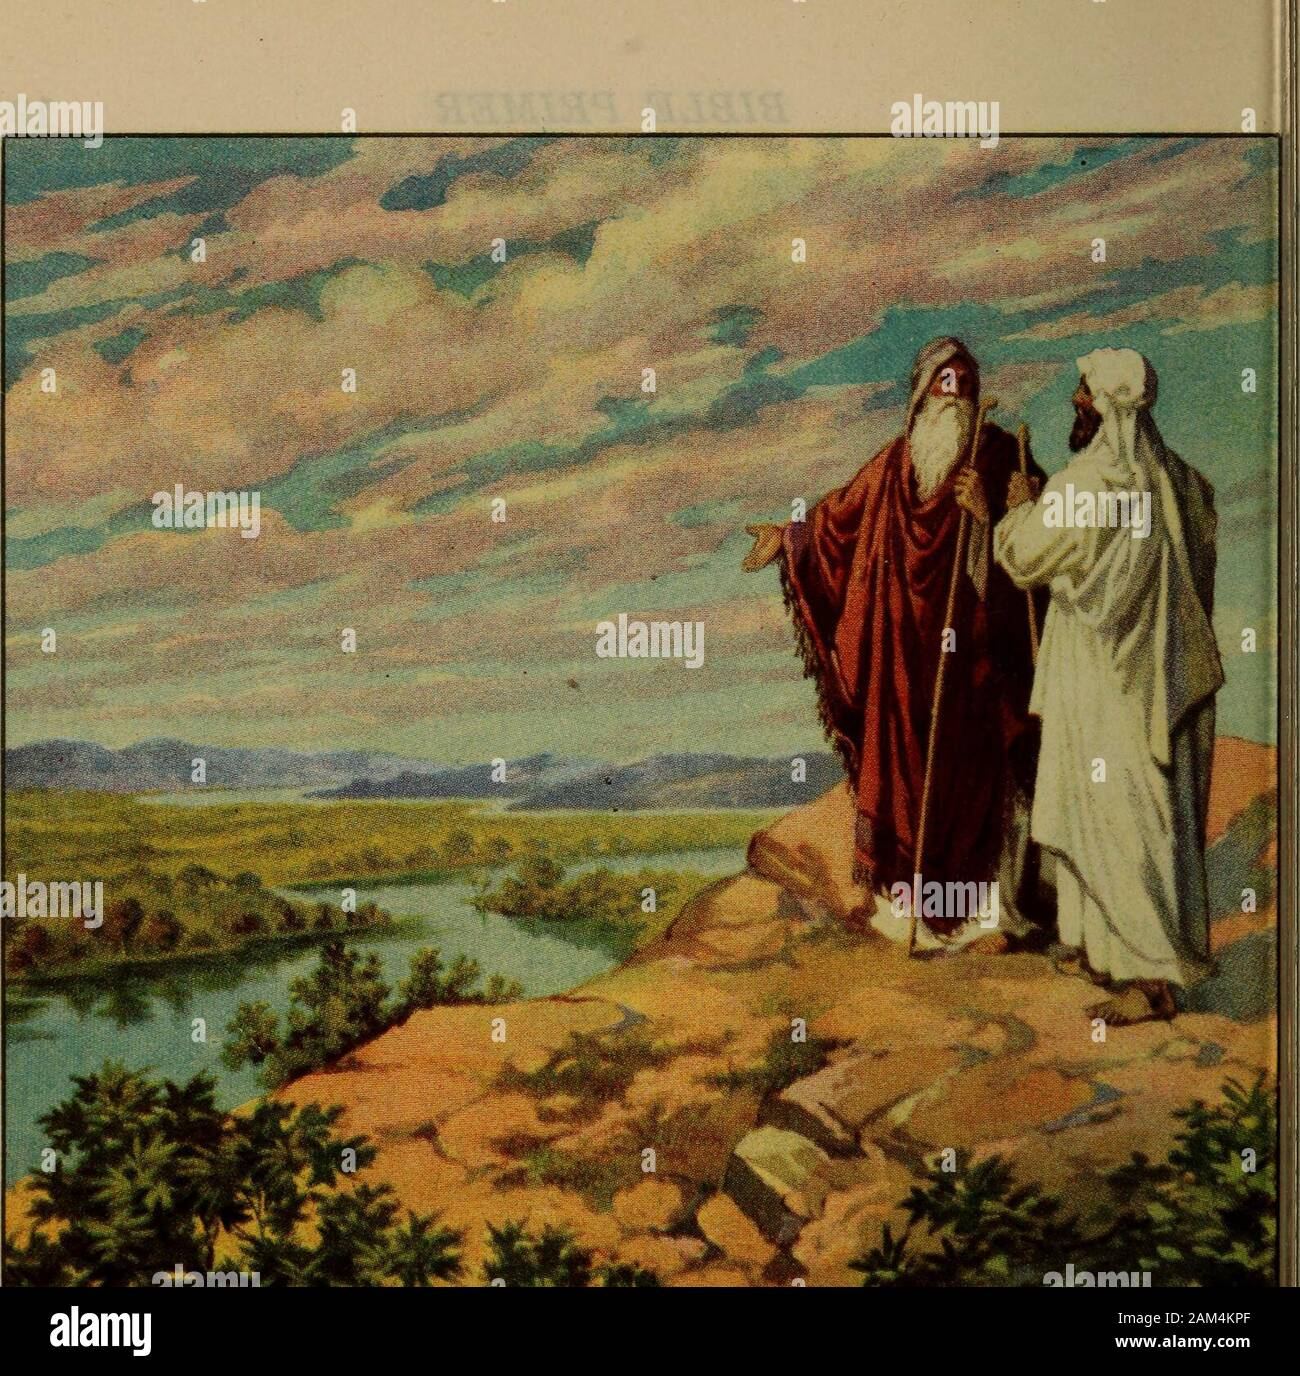 sohn abrahams im alten testament